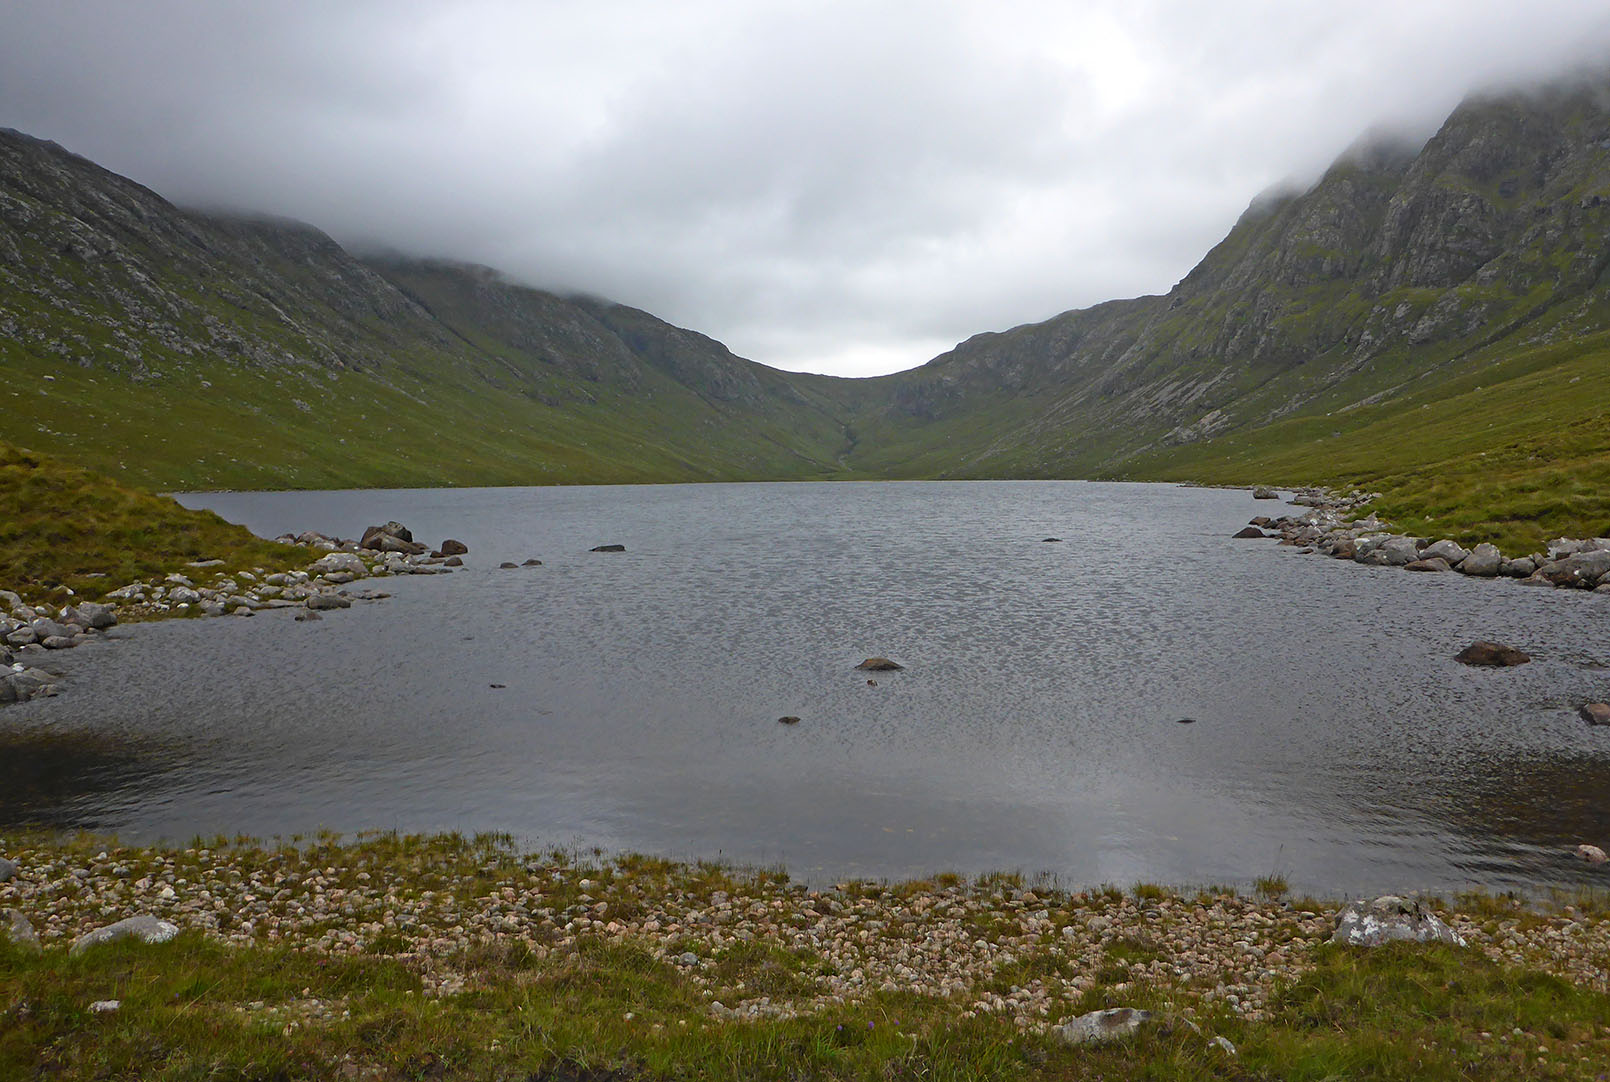 135 Loch a Ghlinne looking towards Ceartabhal & Huisabhal Mor